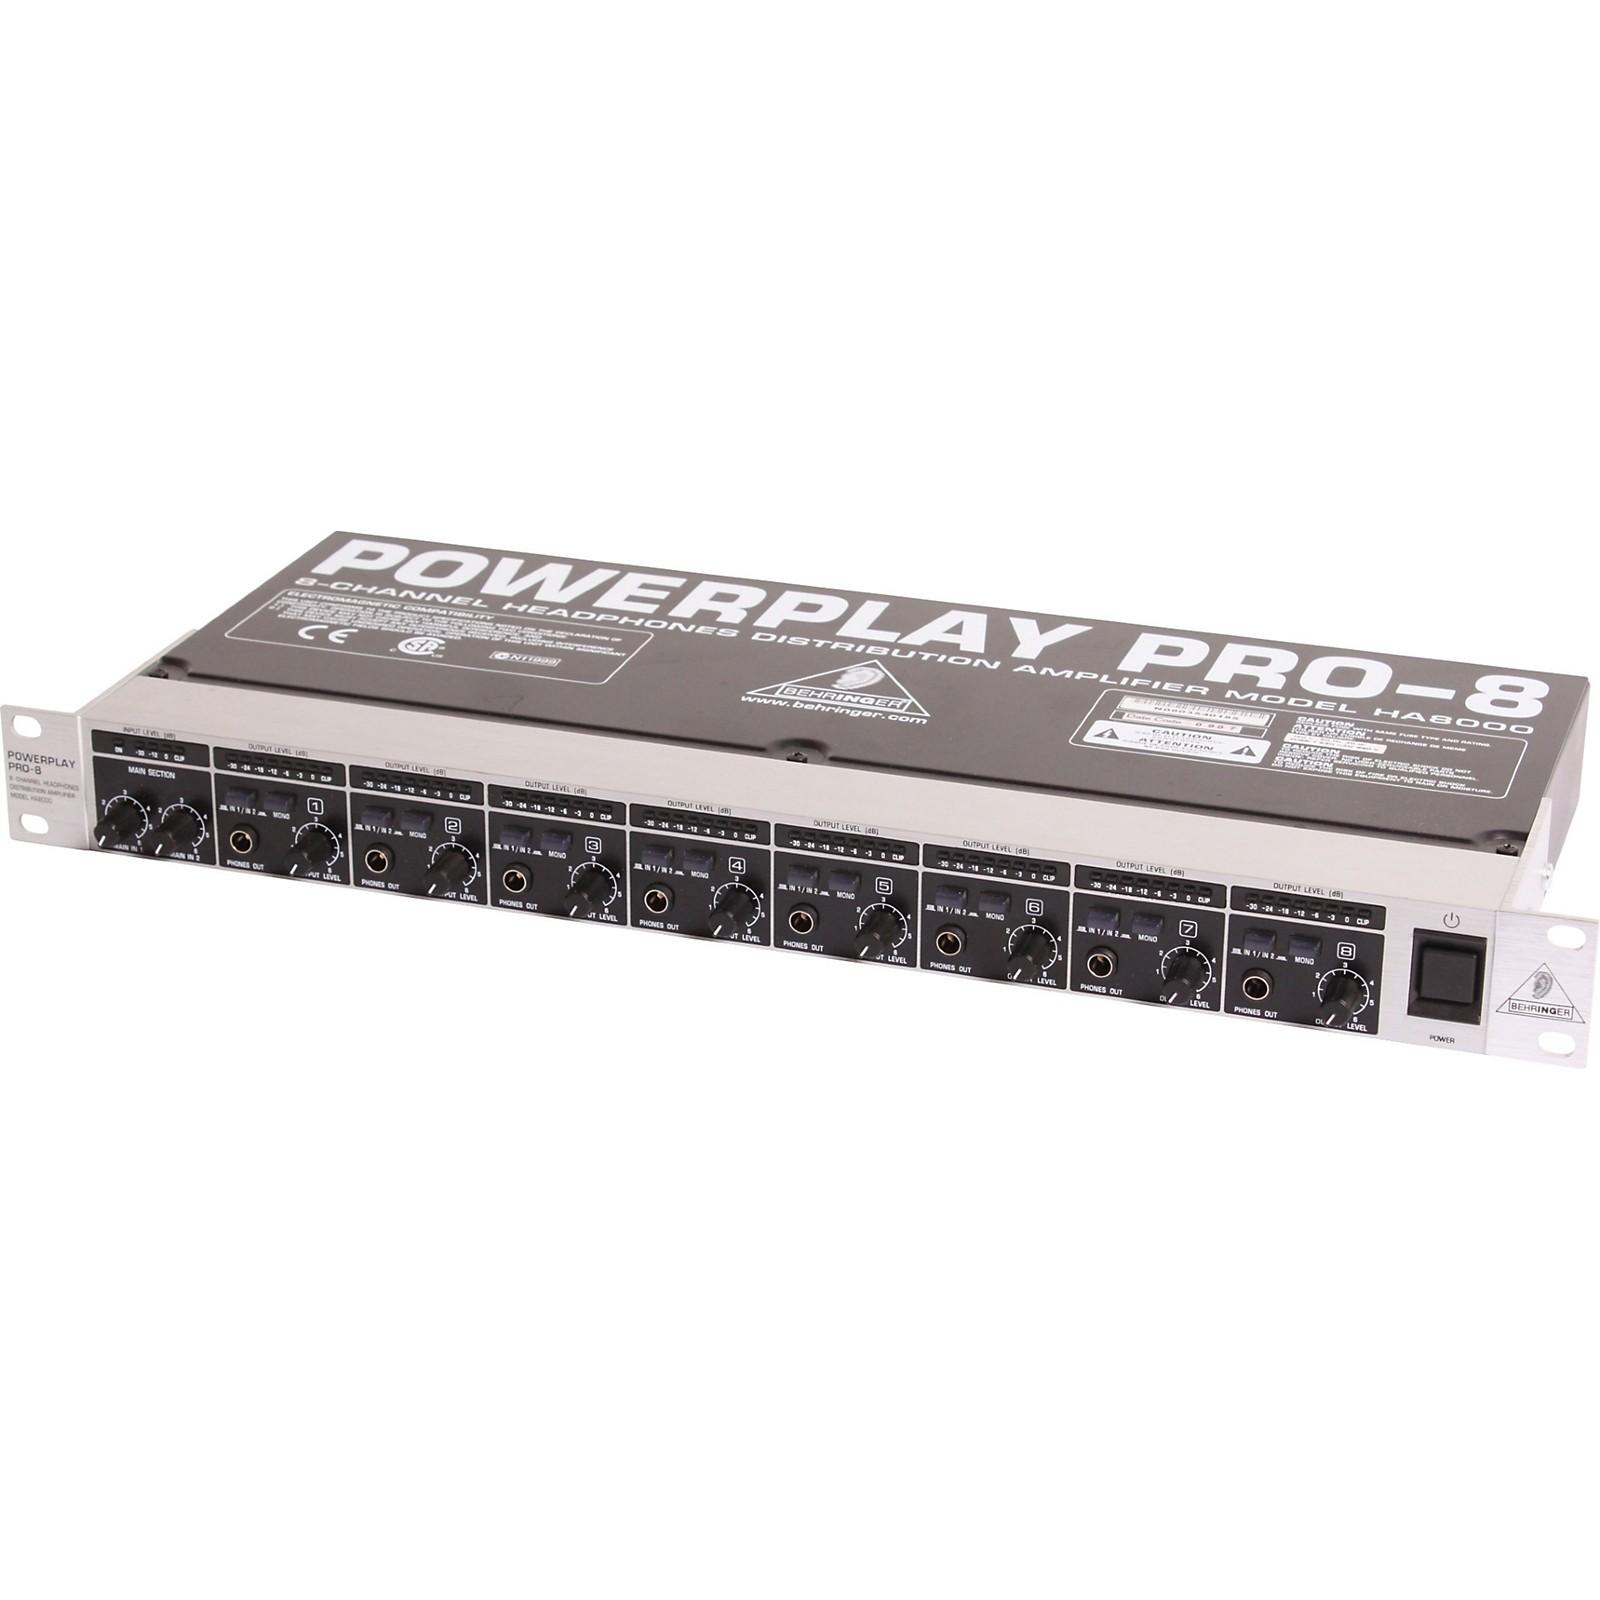 Behringer Powerplay PRO-8 HA-8000 Headphone Amp